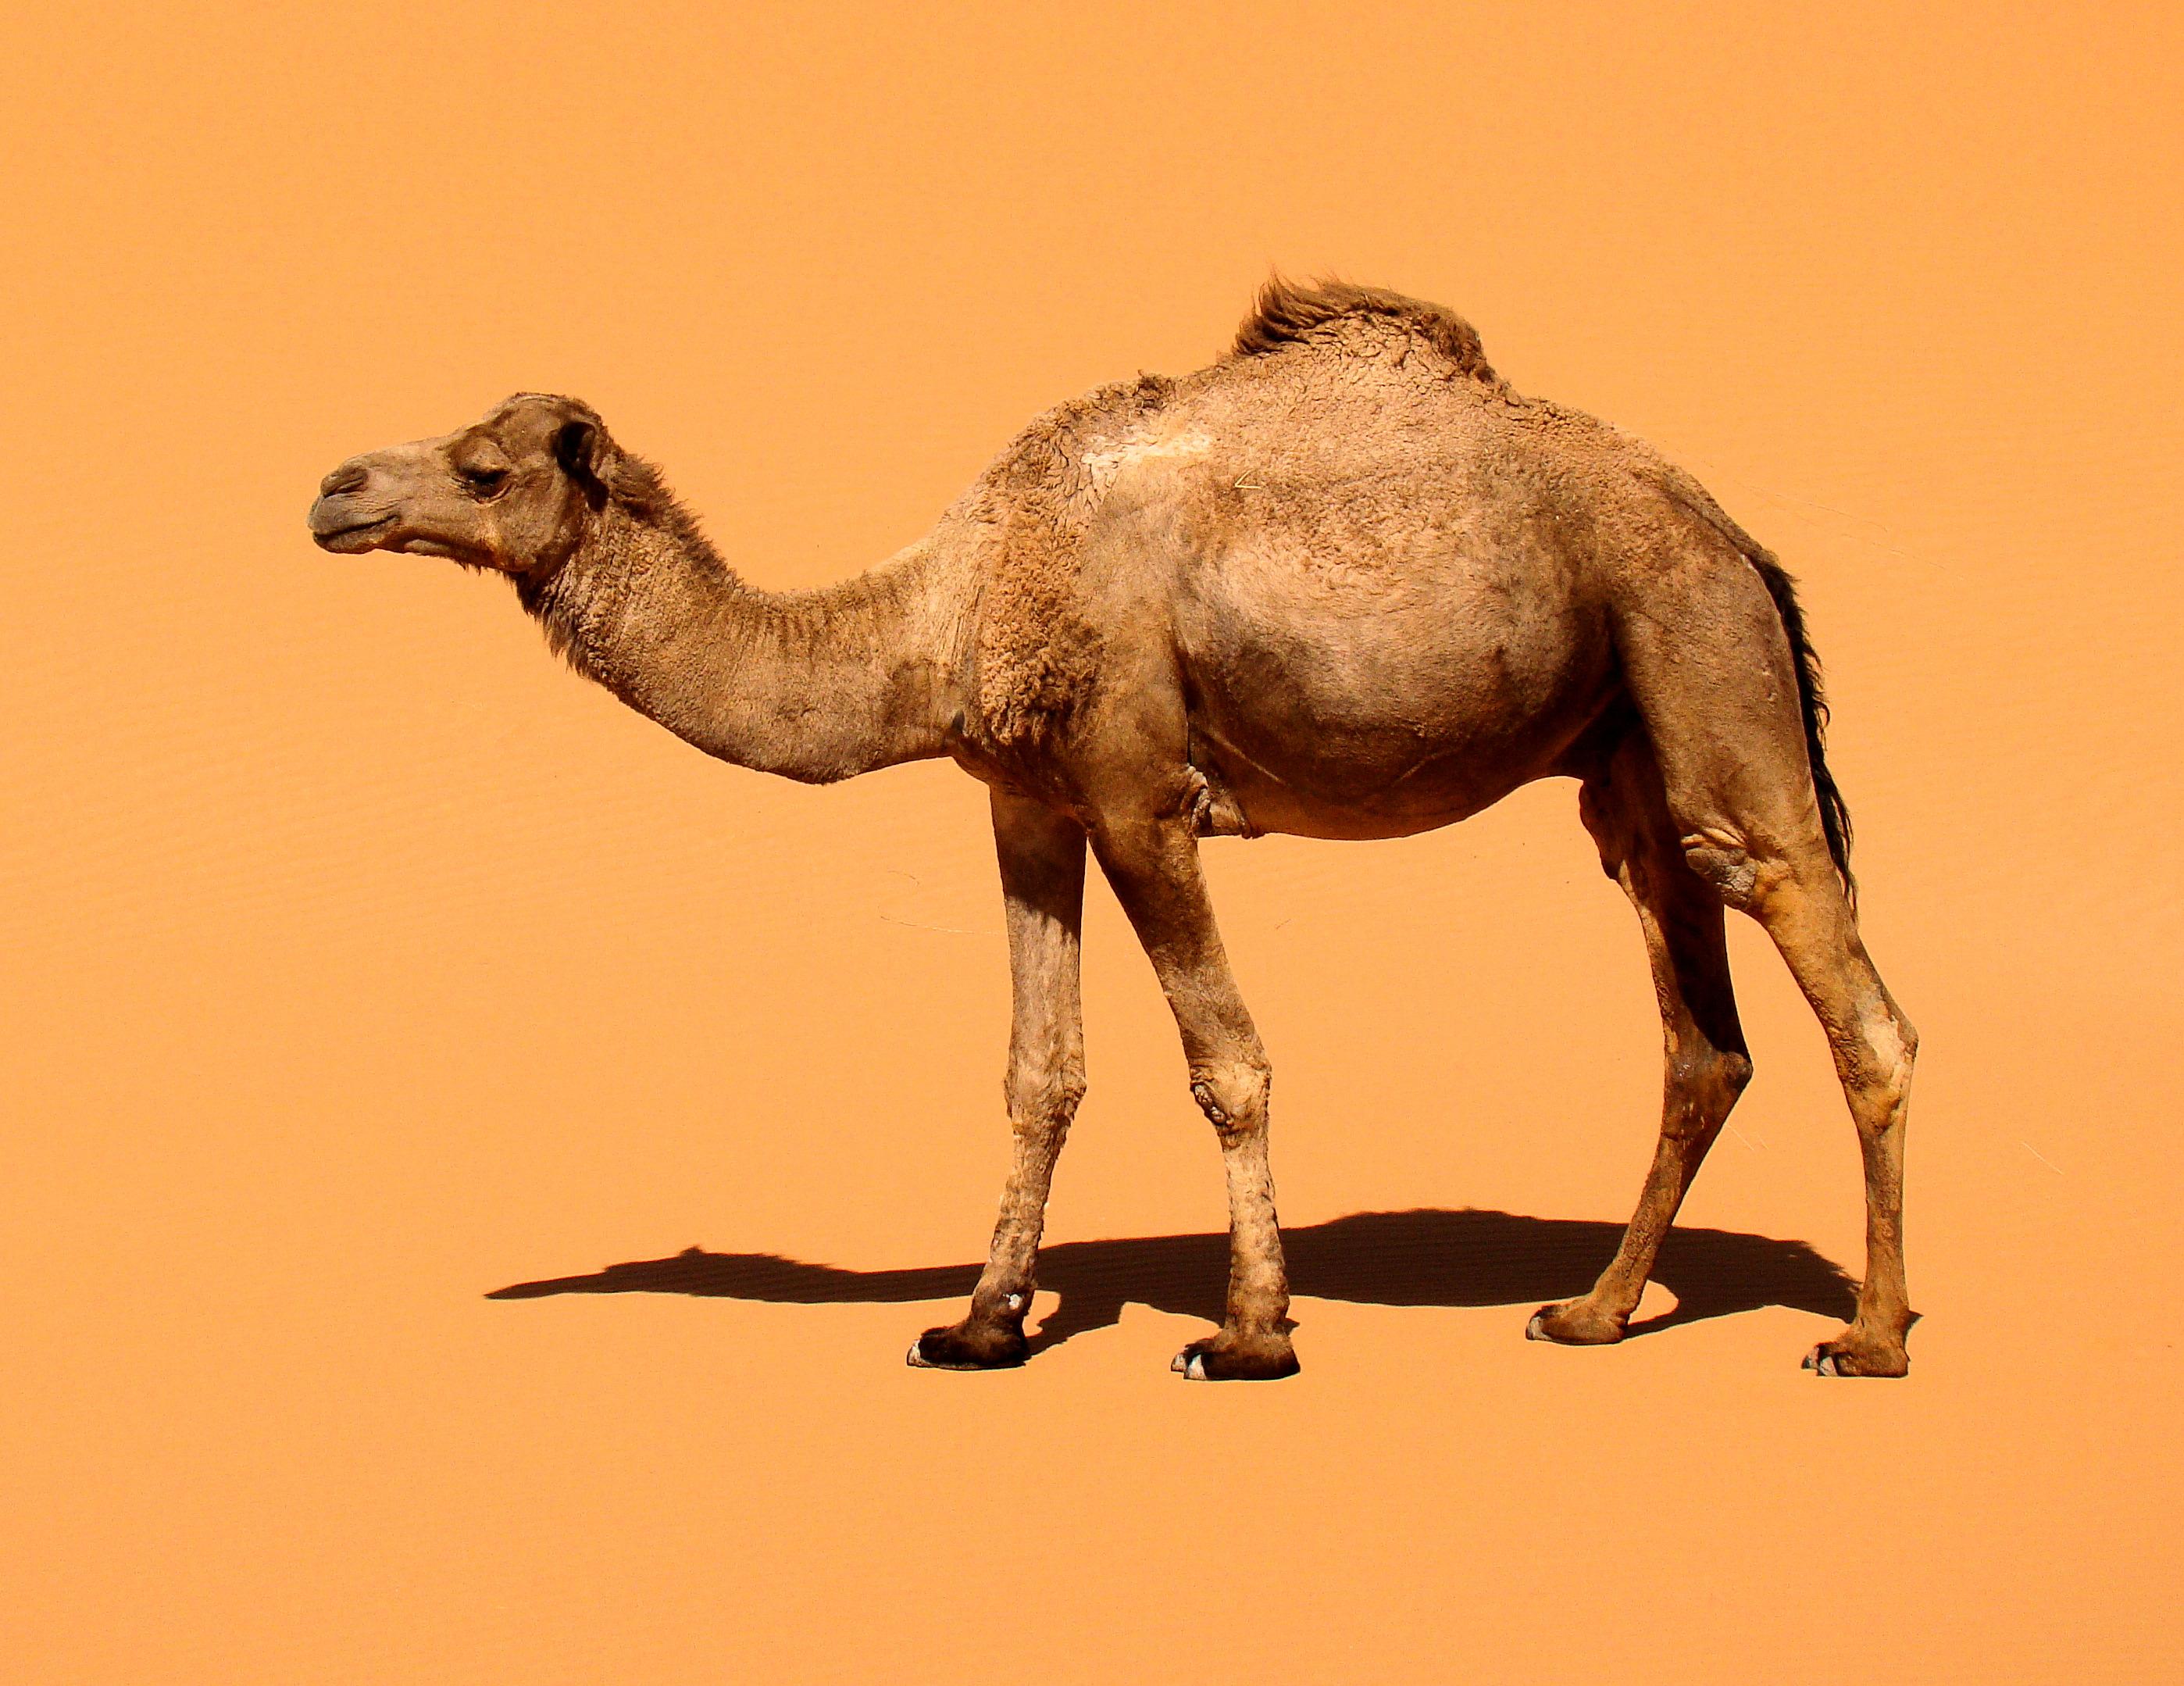 Camel-Dromendary